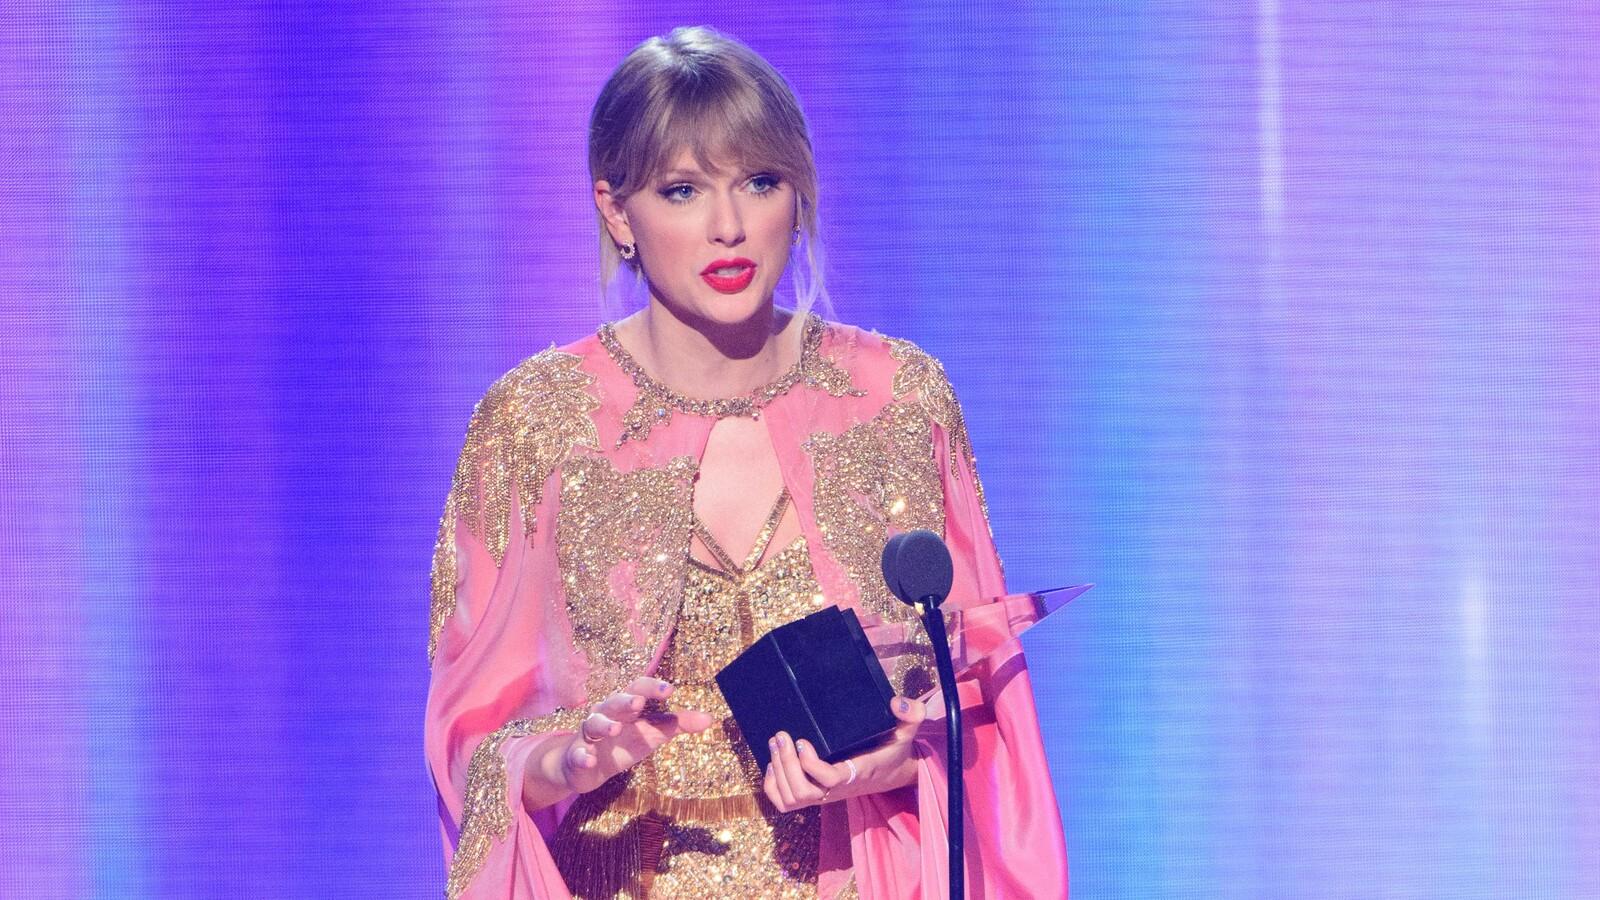 American Music Awards 2019 Winners Complete List The American Music Awards